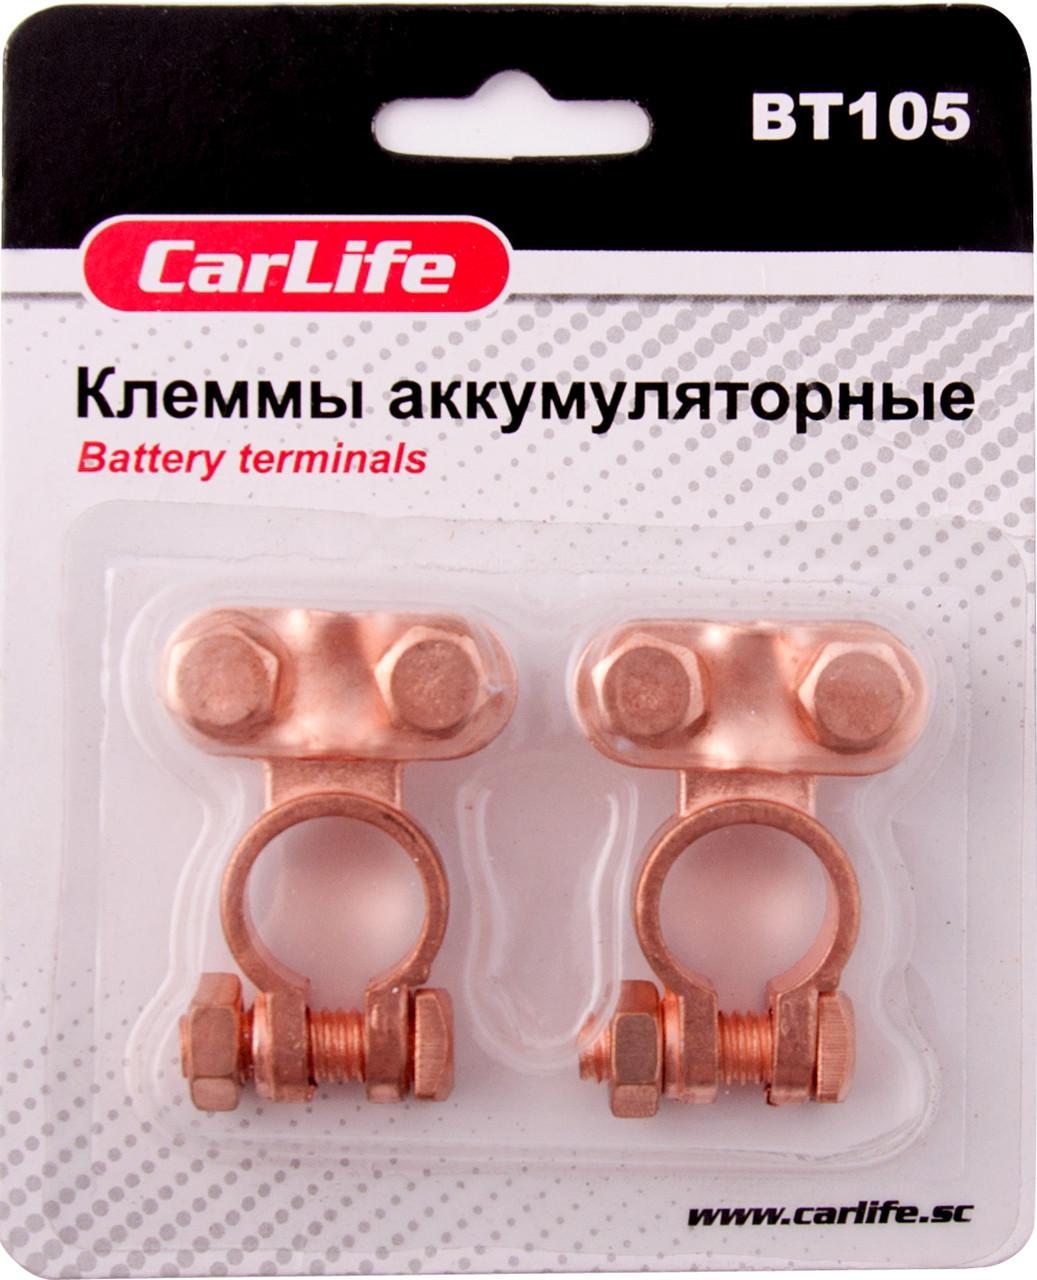 Аккумуляторные клеммы CarLife BT 105